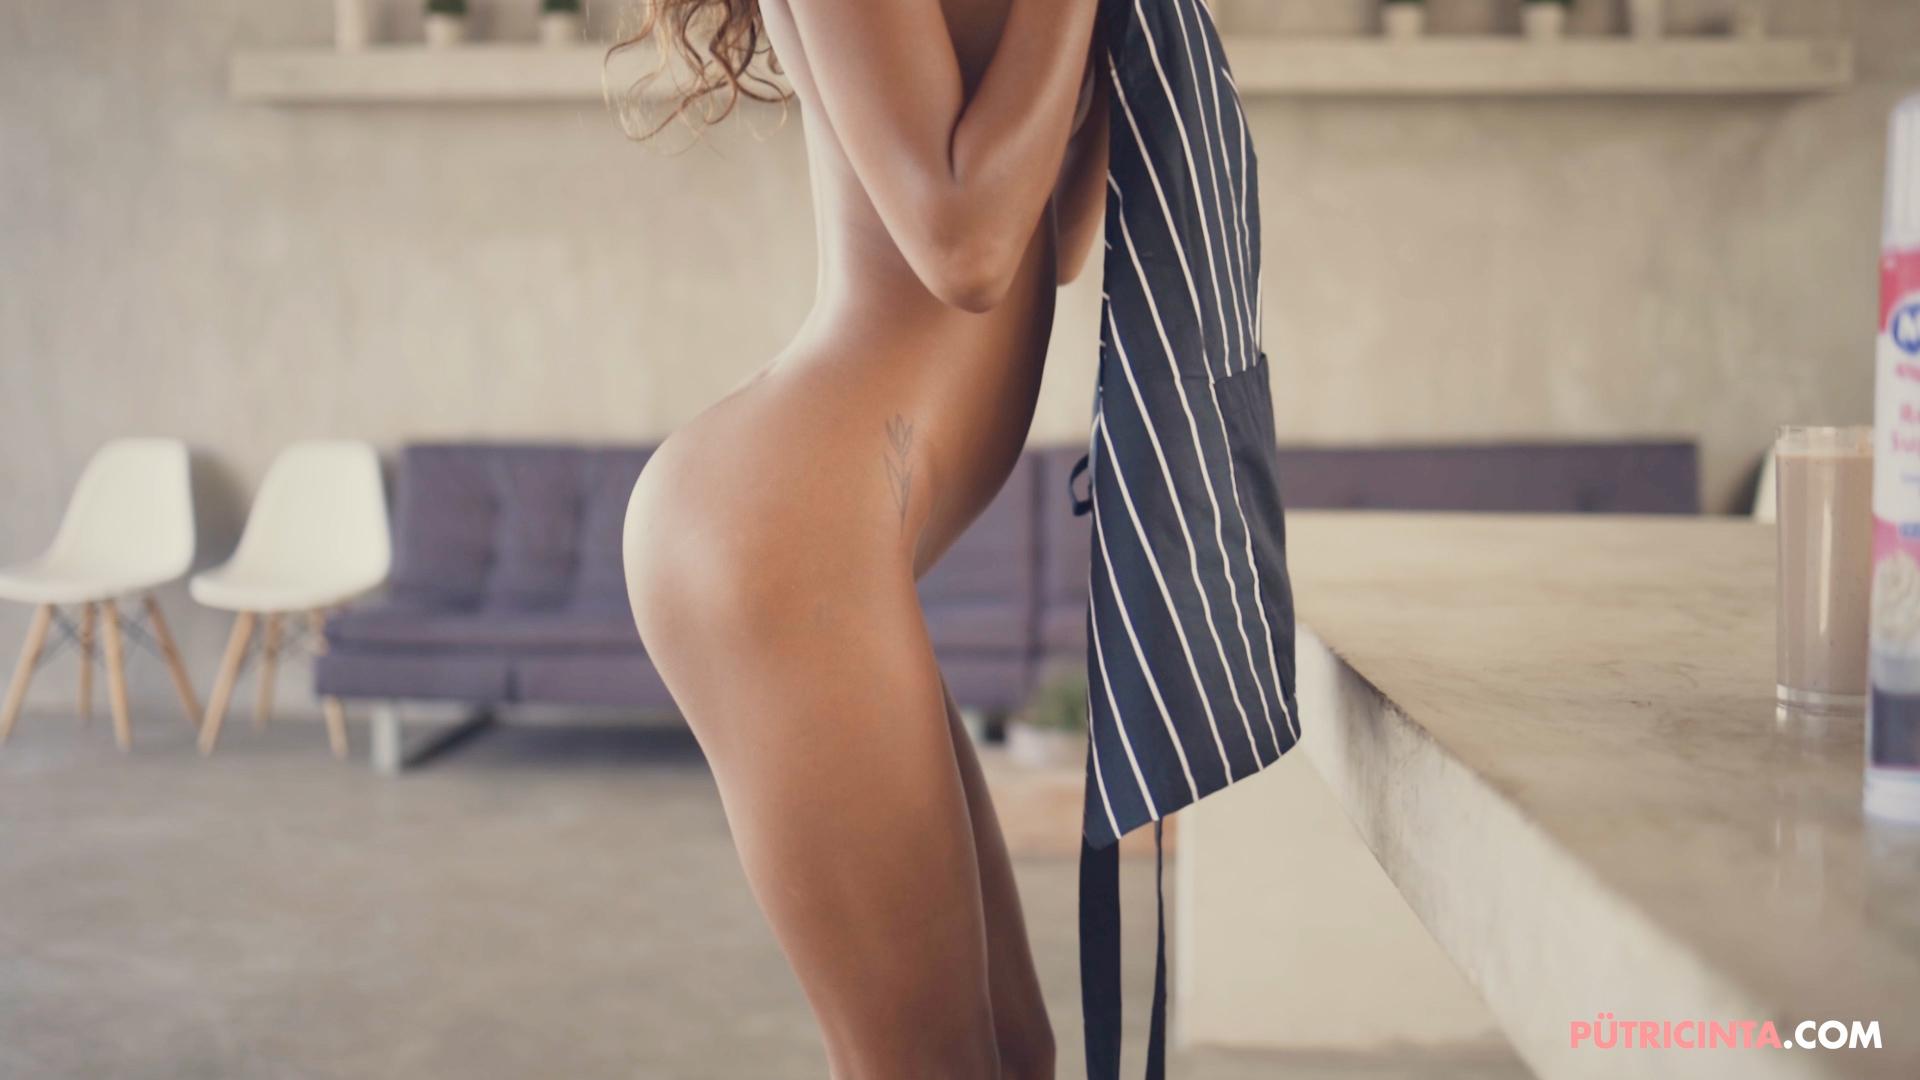 028-Putri-Cinta-Cooking-Class-mainvid-stills-45.jpg